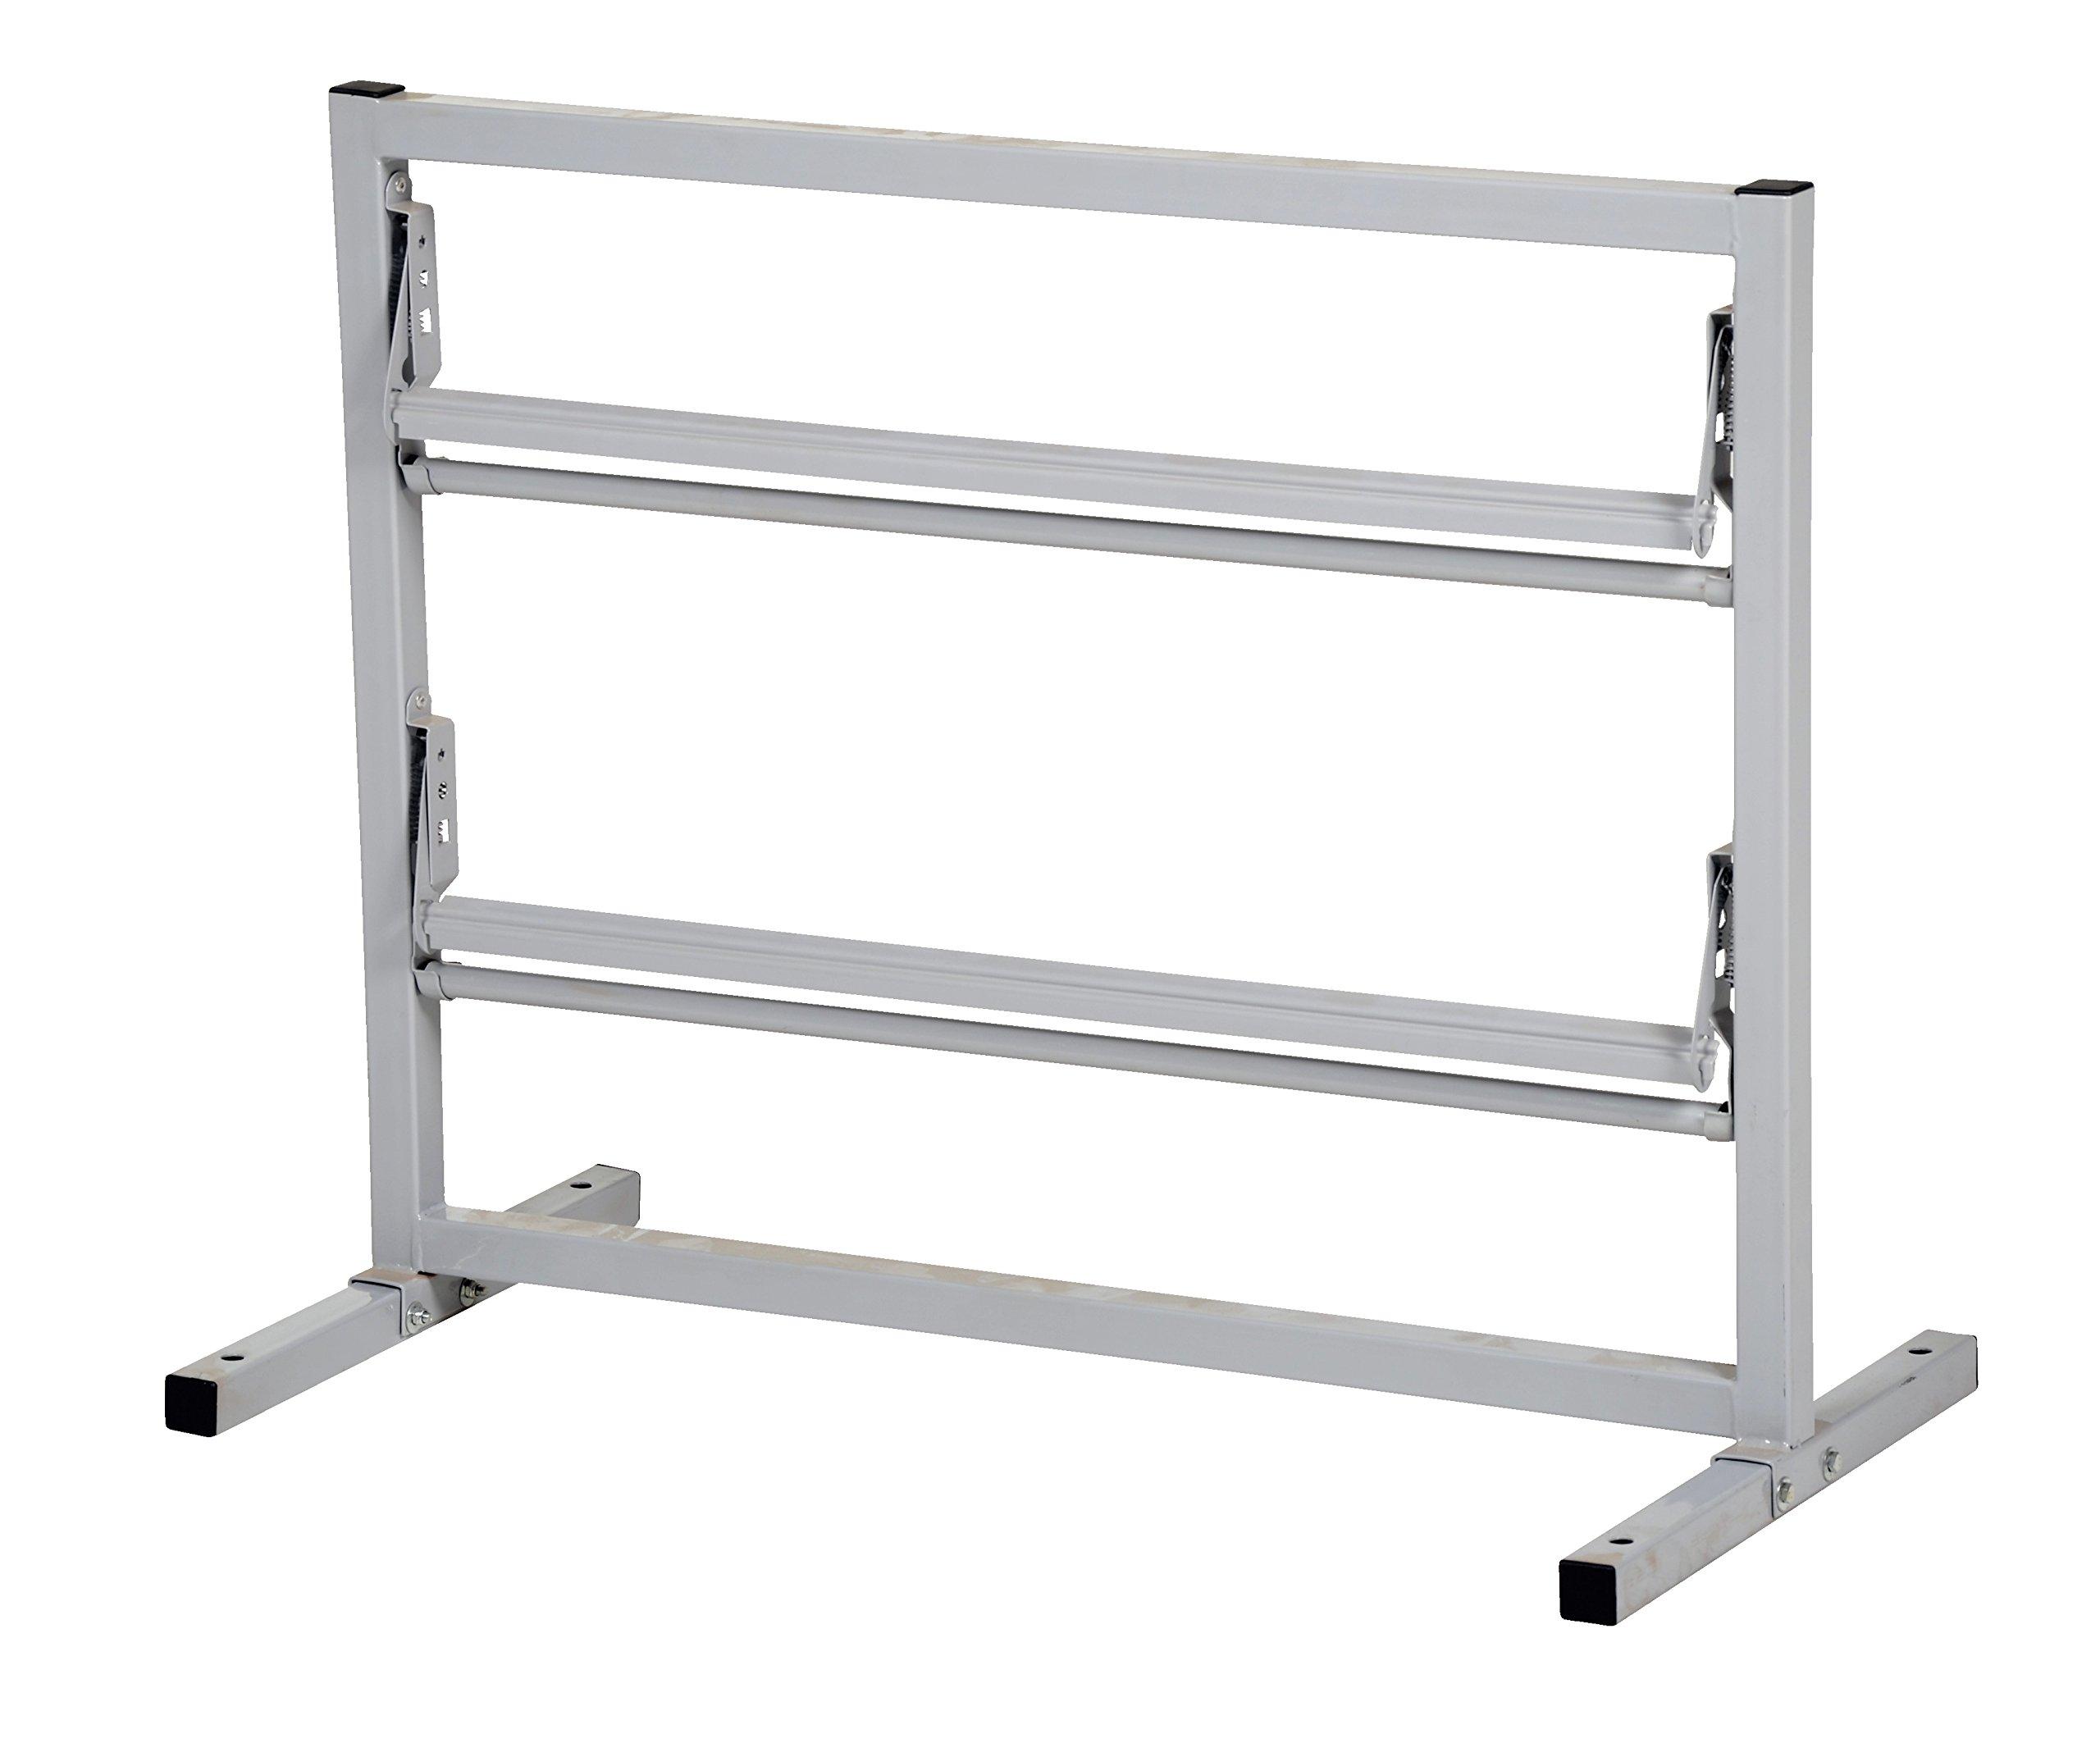 Vestil PDS-2-48 2 Tier Paper Dispenser Stand, 48'' Roll Width, Steel, 53'' Width, 27.375'' Height